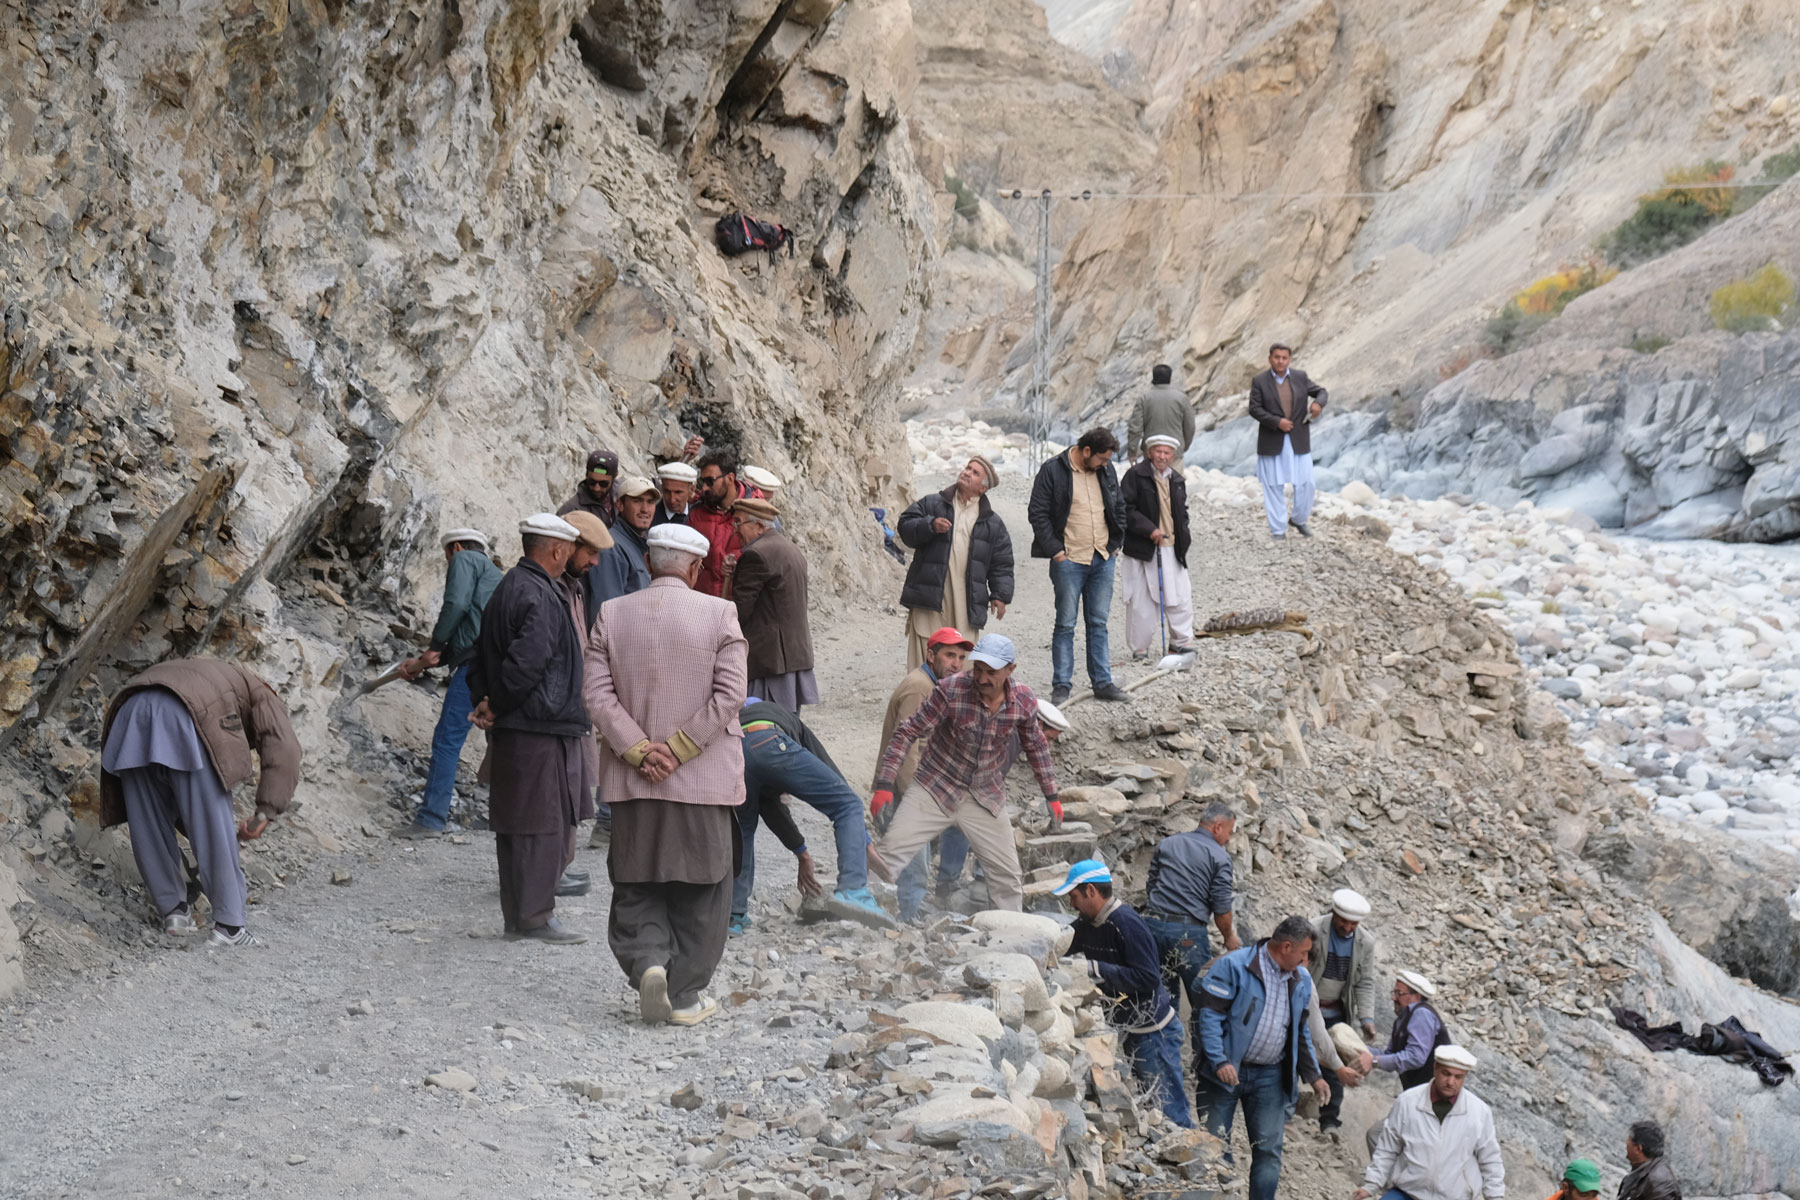 Pakistanische Männer reparieren eine Gebirgsstraße im Karakorumgebirge.